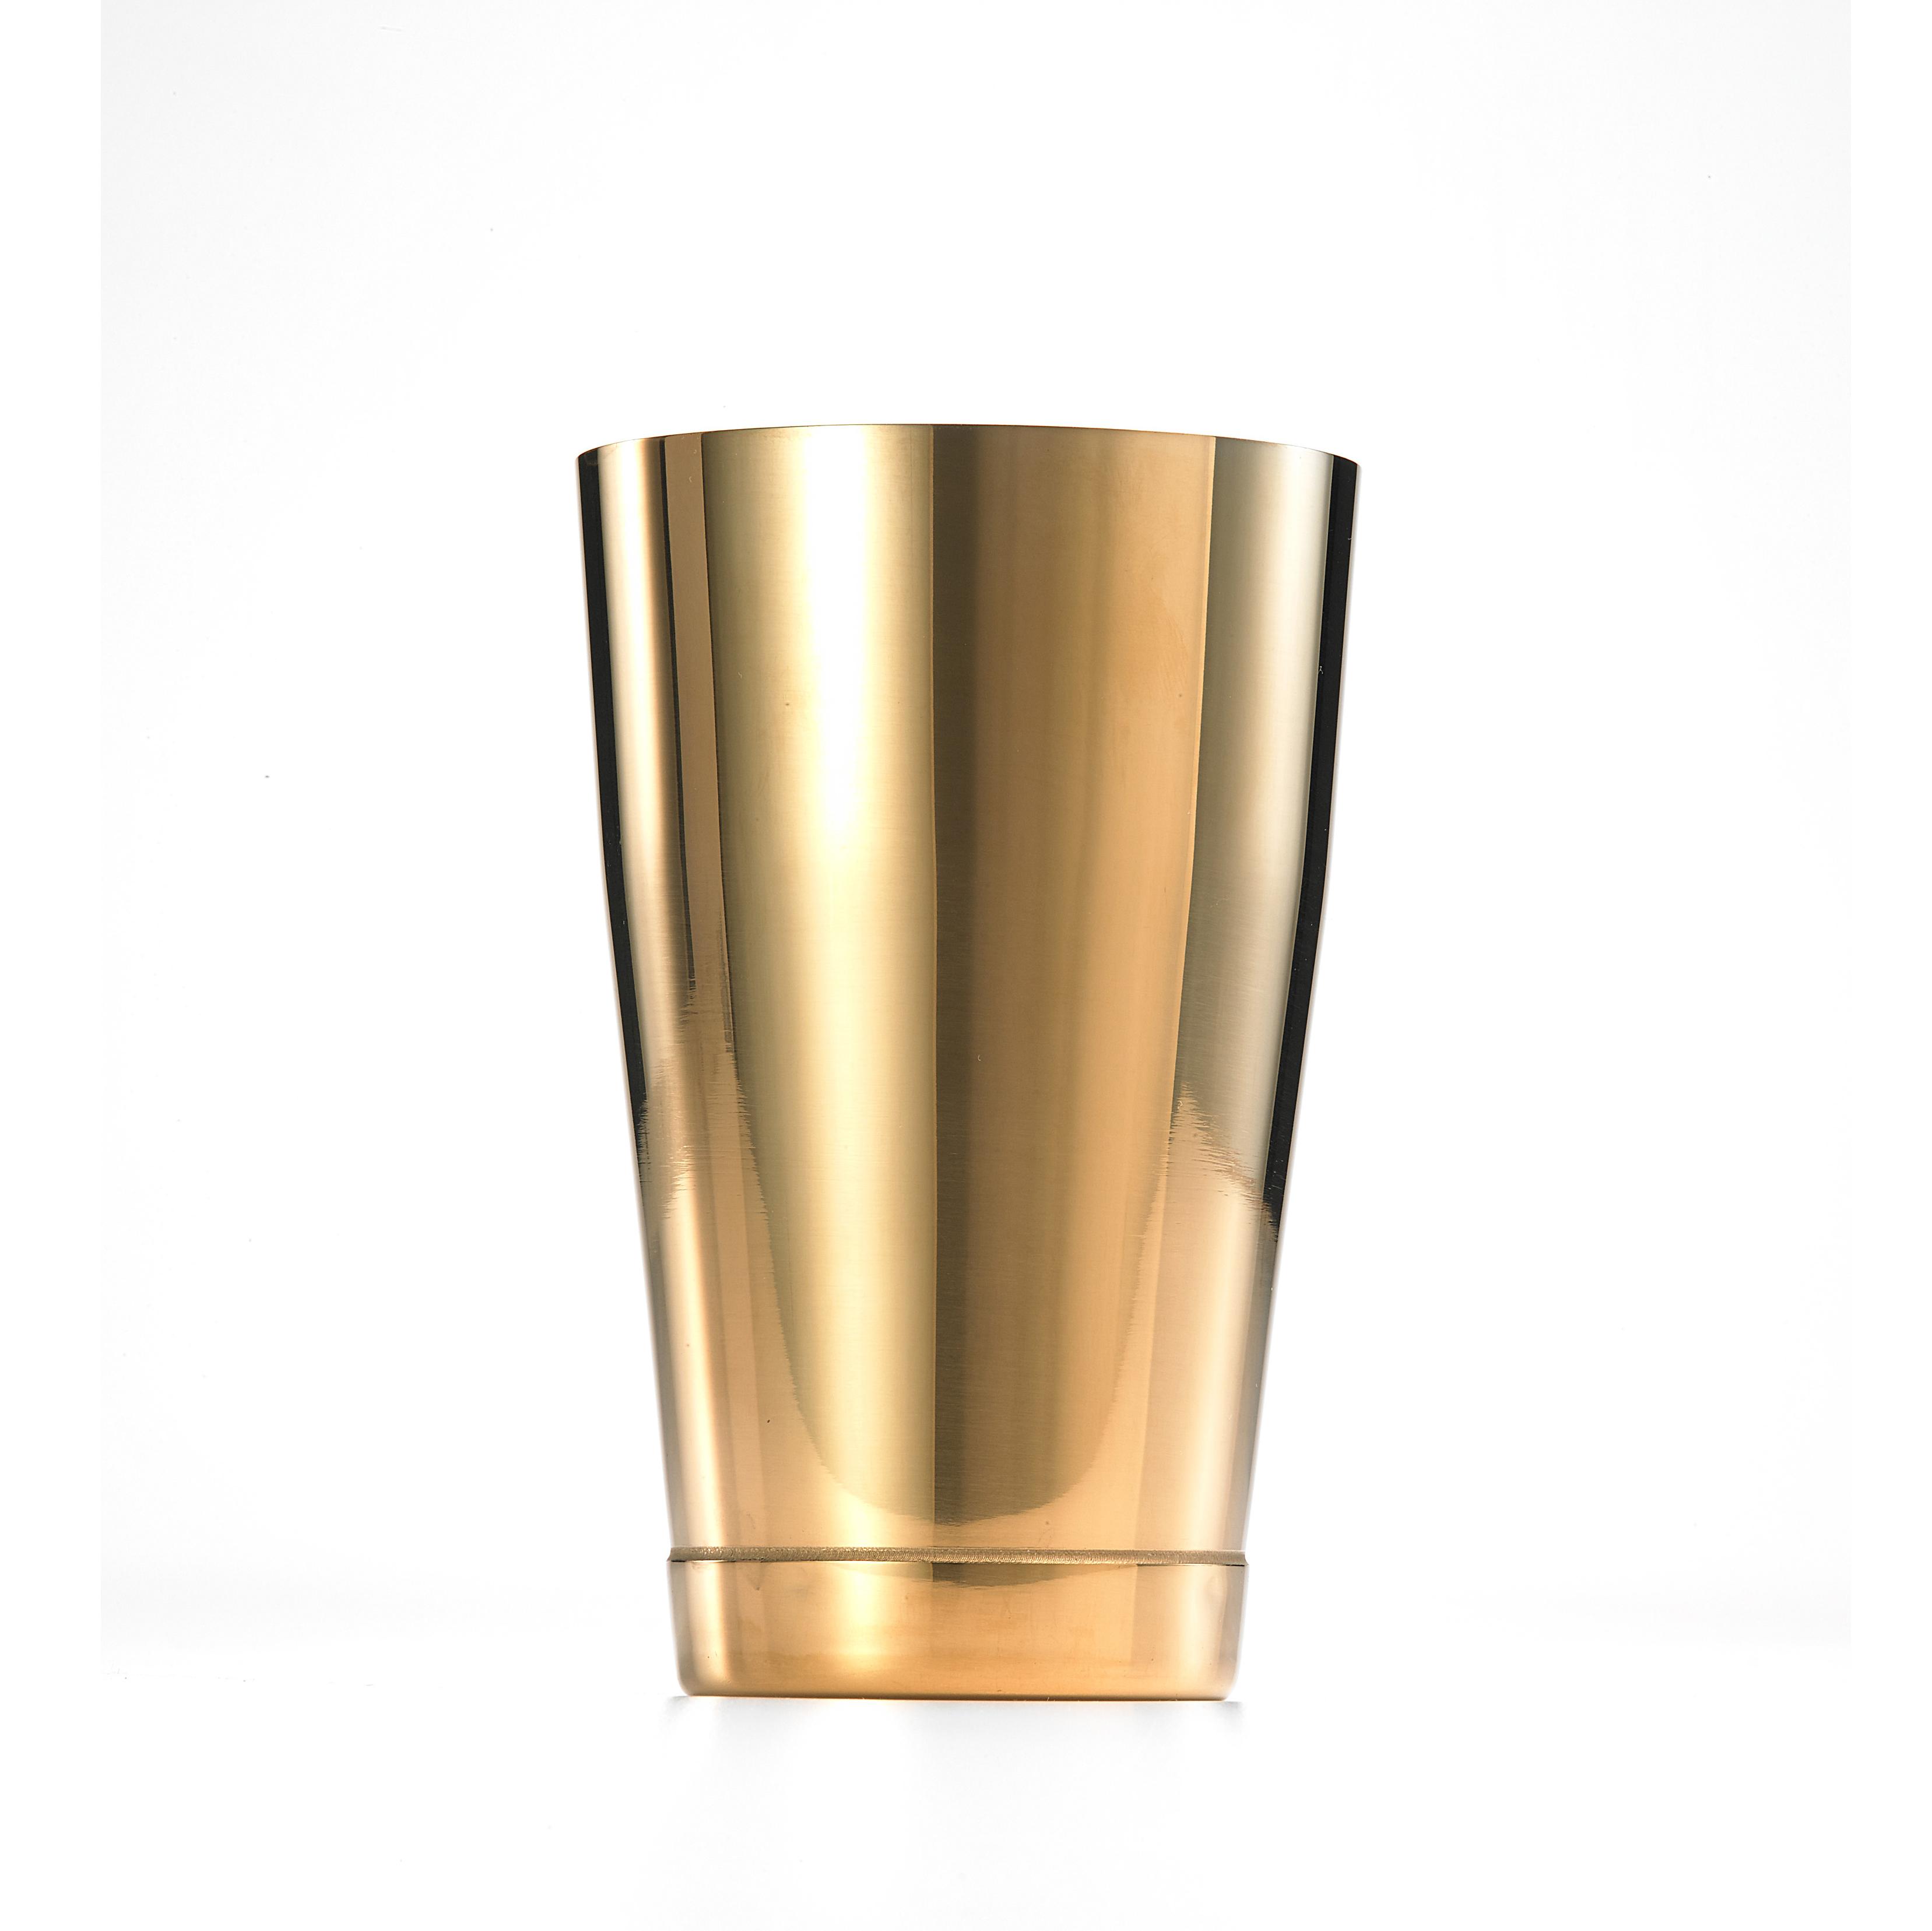 Barfly M37007GD bar cocktail shaker